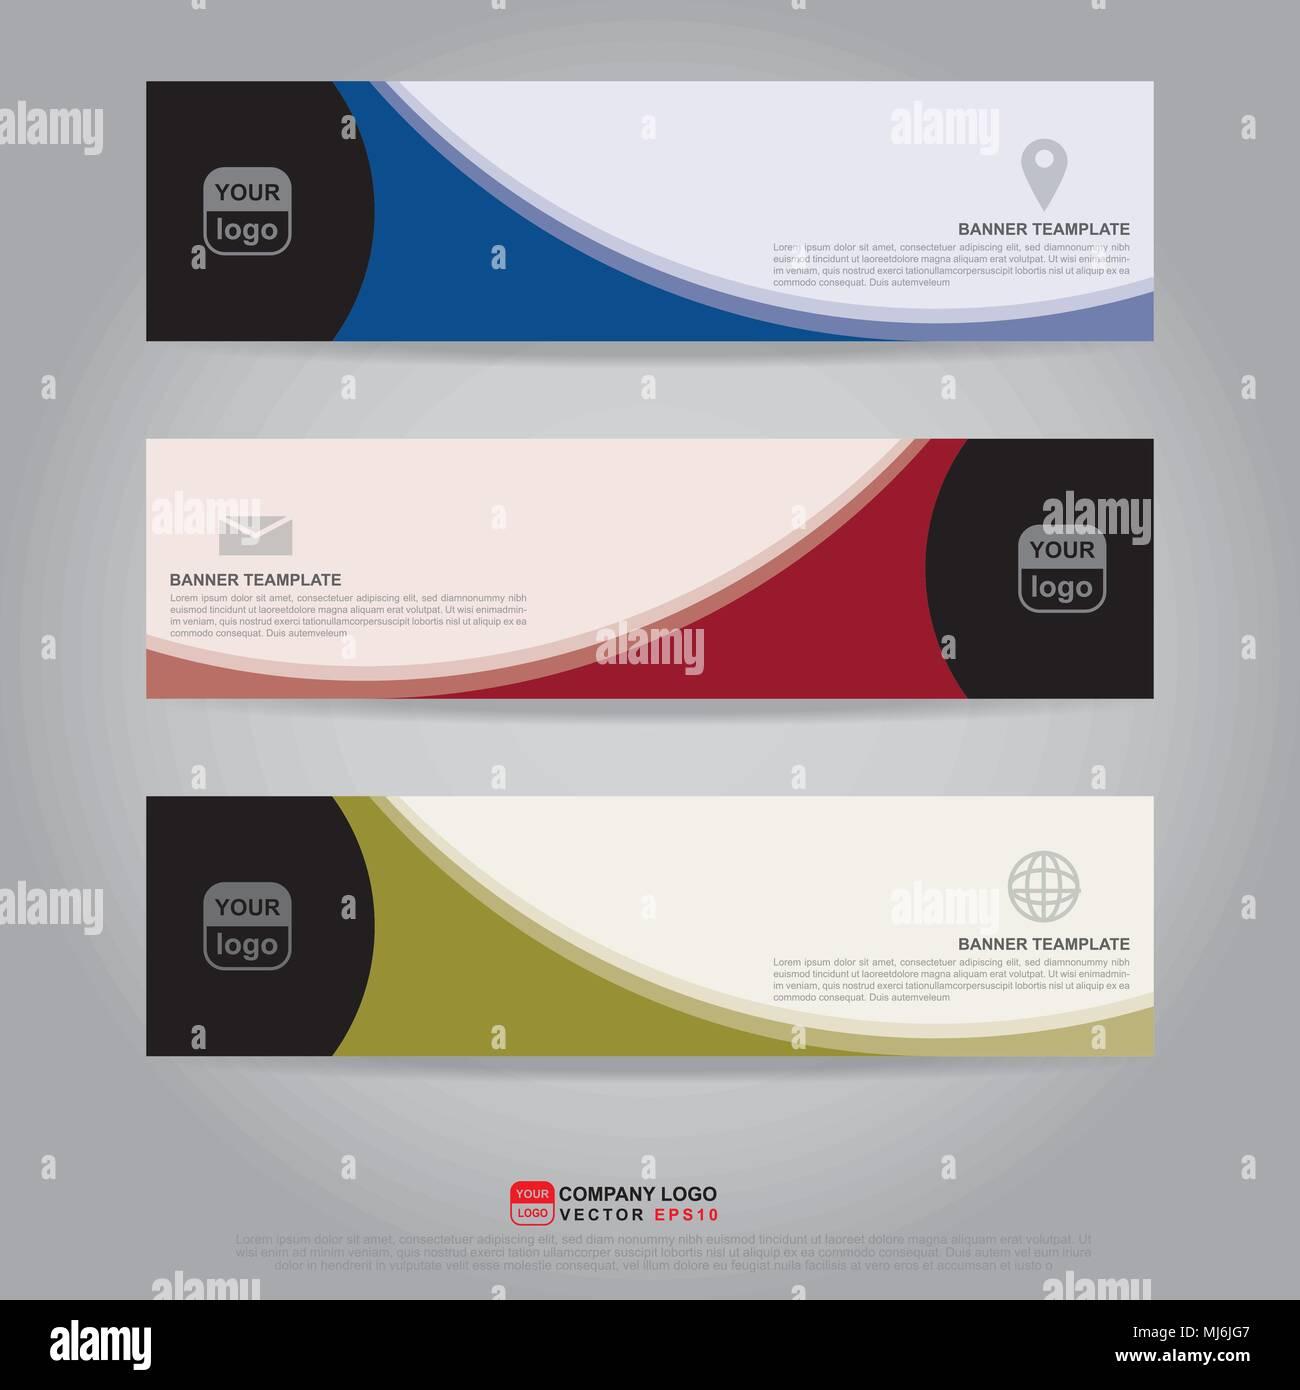 Template Of Banner Brochure Flyer And Card Voucher For Header Template Presentation Web Banner Business Design Vector Illustration Eps10 Cmyk Stock Vector Image Art Alamy